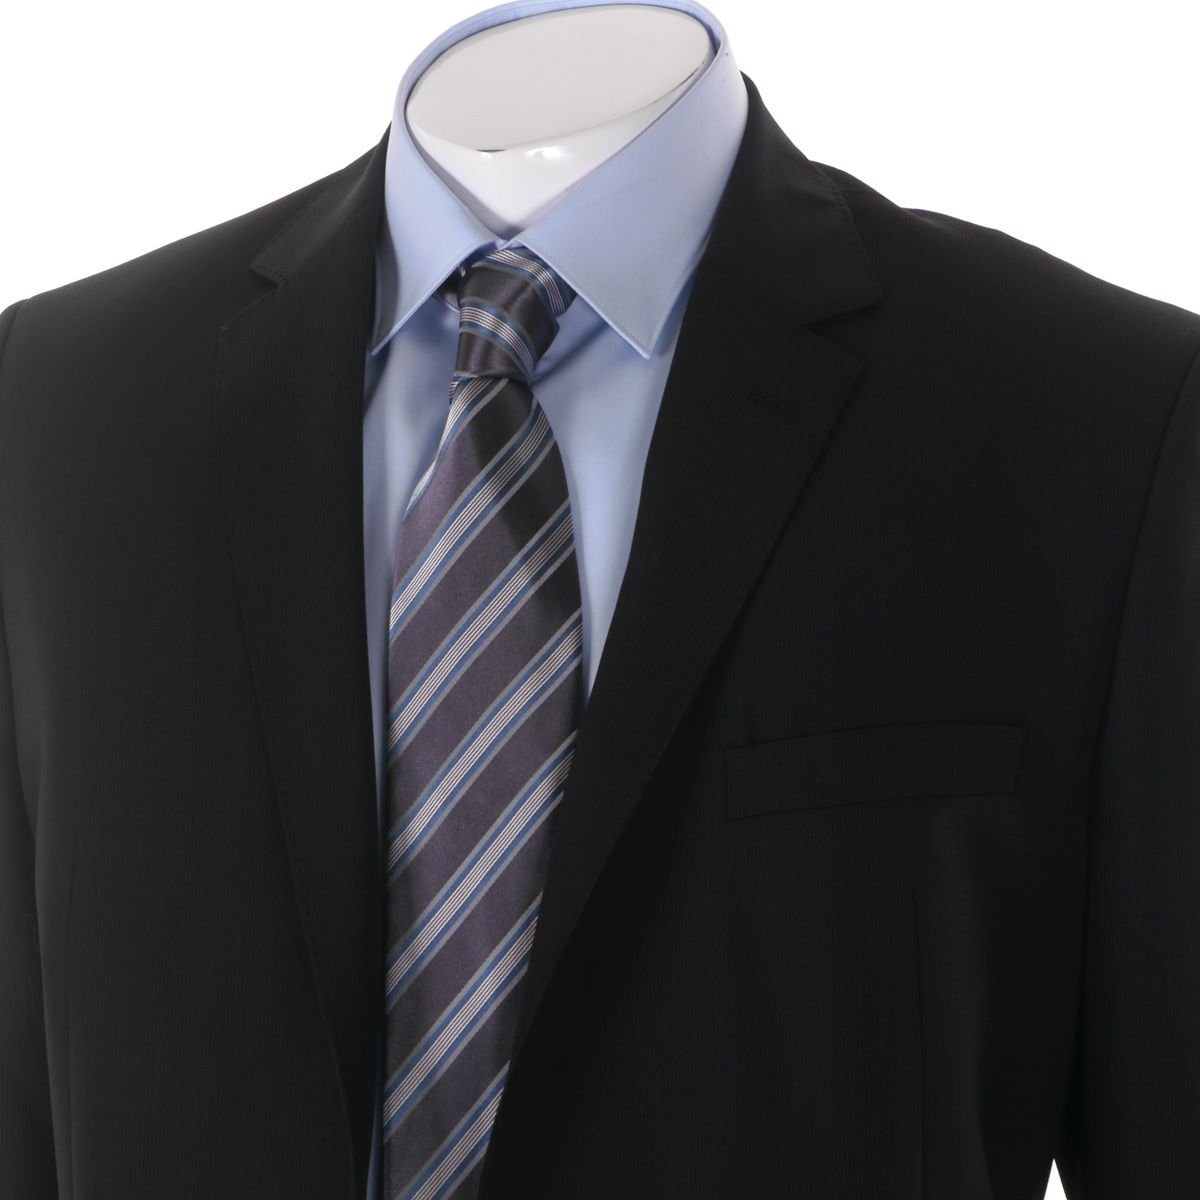 veste de costume excellence noir taille standard jusqu 39 au 74 maneven maneven. Black Bedroom Furniture Sets. Home Design Ideas